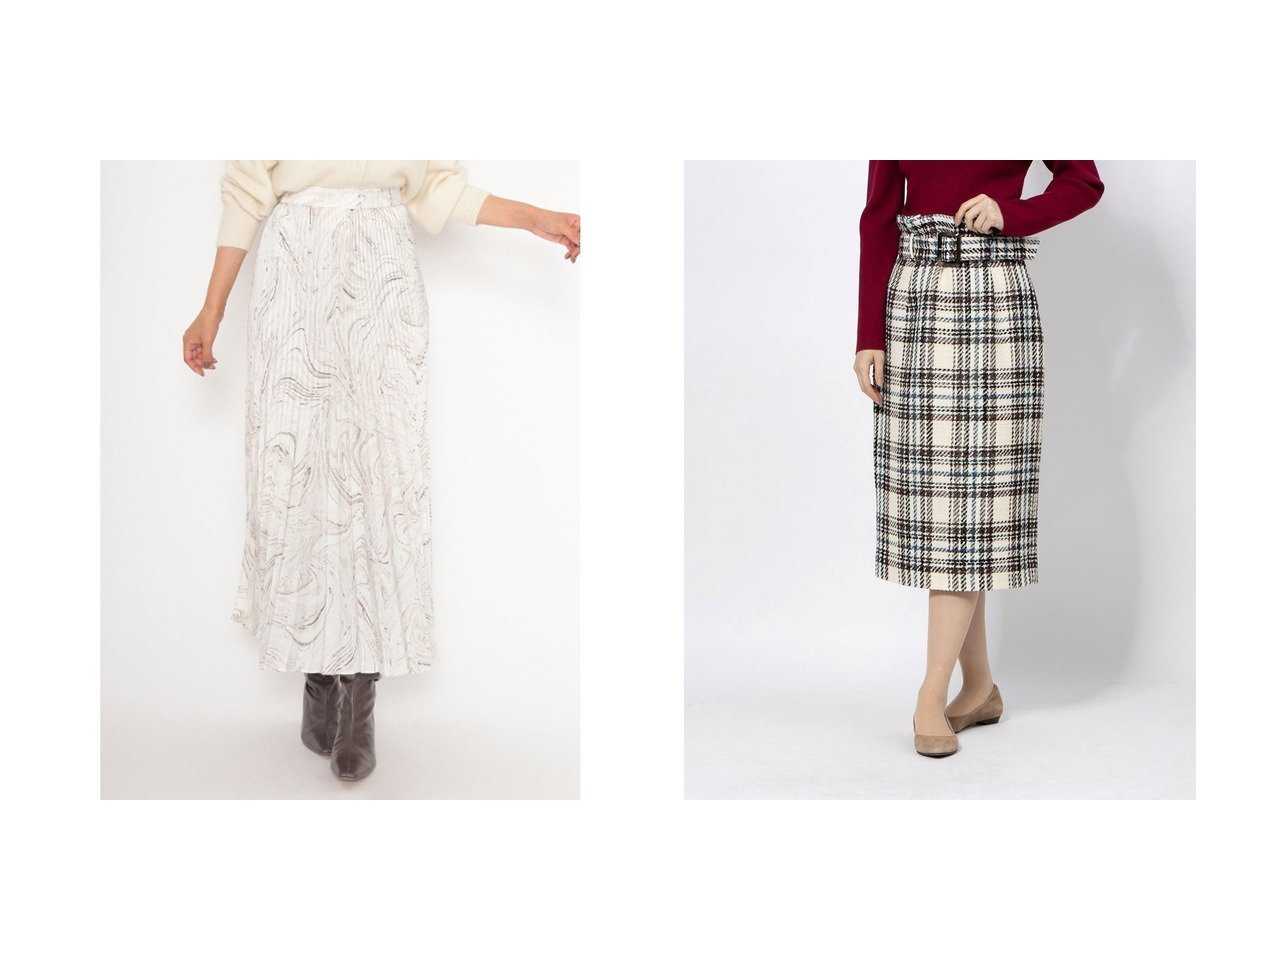 【JUSGLITTY/ジャスグリッティー】のロービングチェックタイトスカート&【SNIDEL/スナイデル】のシャイニープリーツナローSK スカートのおすすめ!人気、レディースファッションの通販 おすすめで人気のファッション通販商品 インテリア・家具・キッズファッション・メンズファッション・レディースファッション・服の通販 founy(ファニー) https://founy.com/ ファッション Fashion レディース WOMEN スカート Skirt サテン シンプル 雑誌 トレンド パープル フェミニン プリーツ マーブル 無地 ロング クラシカル バランス |ID:crp329100000001508